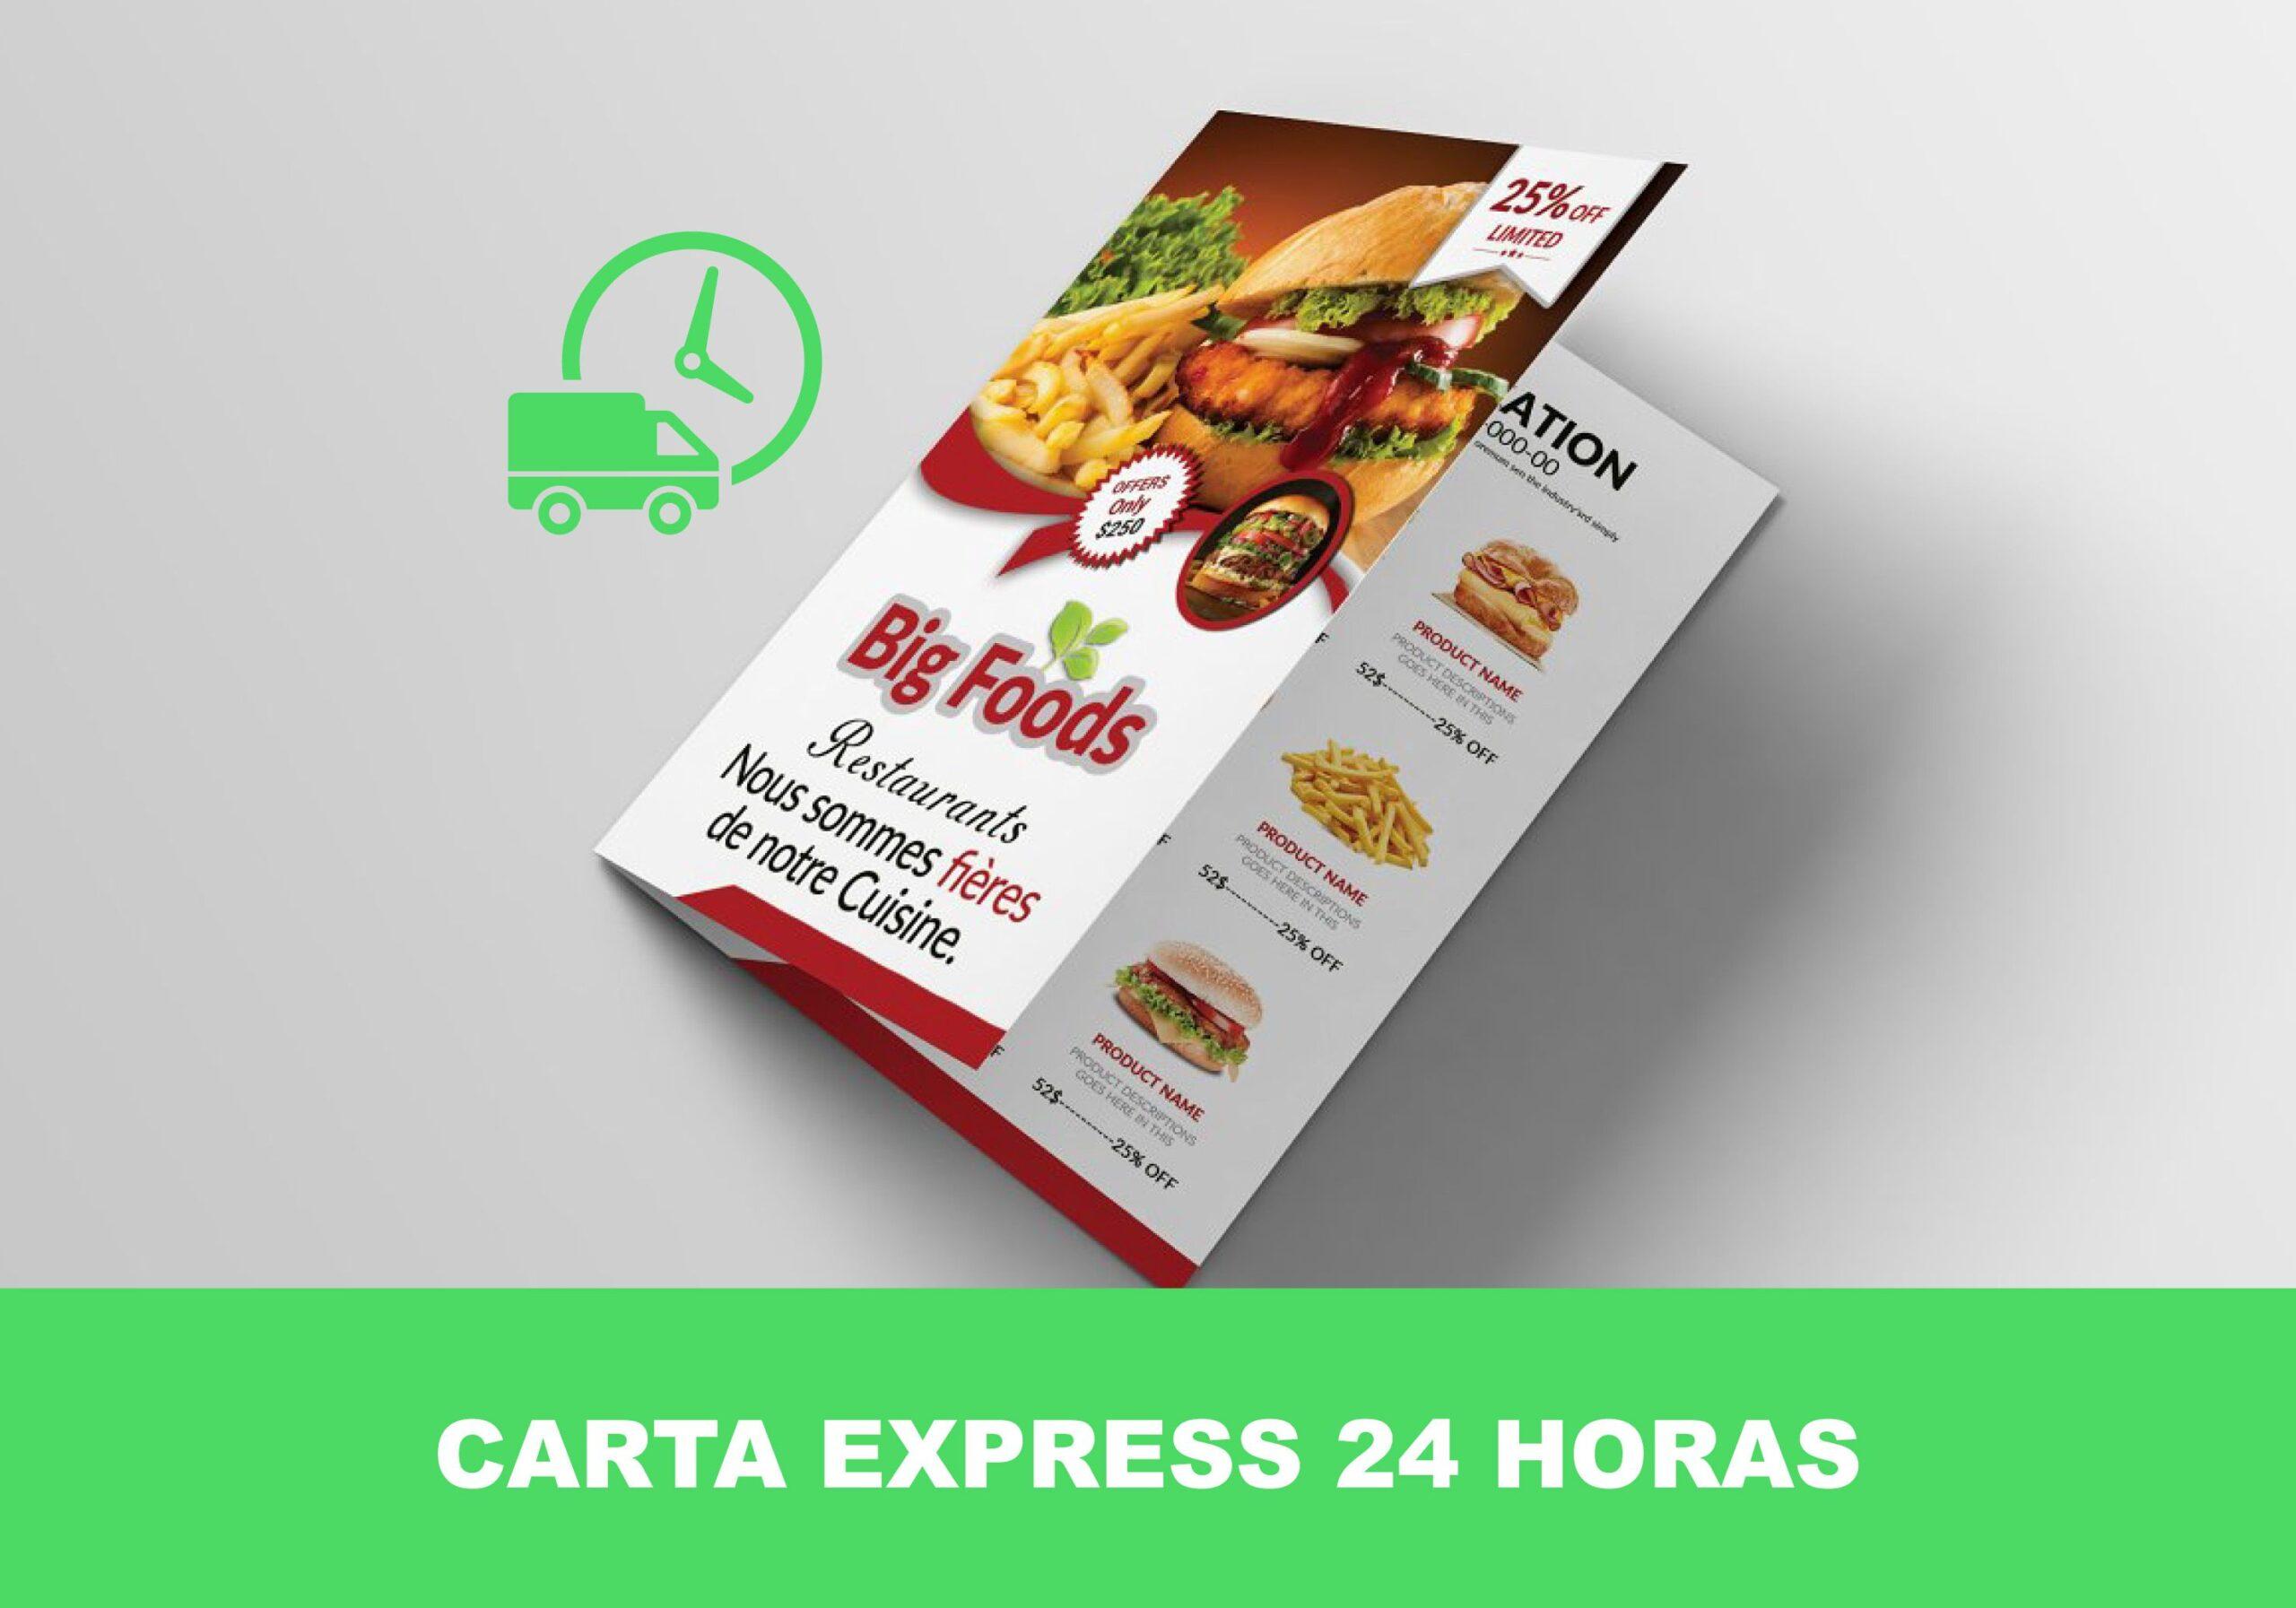 Carta express 24 horas